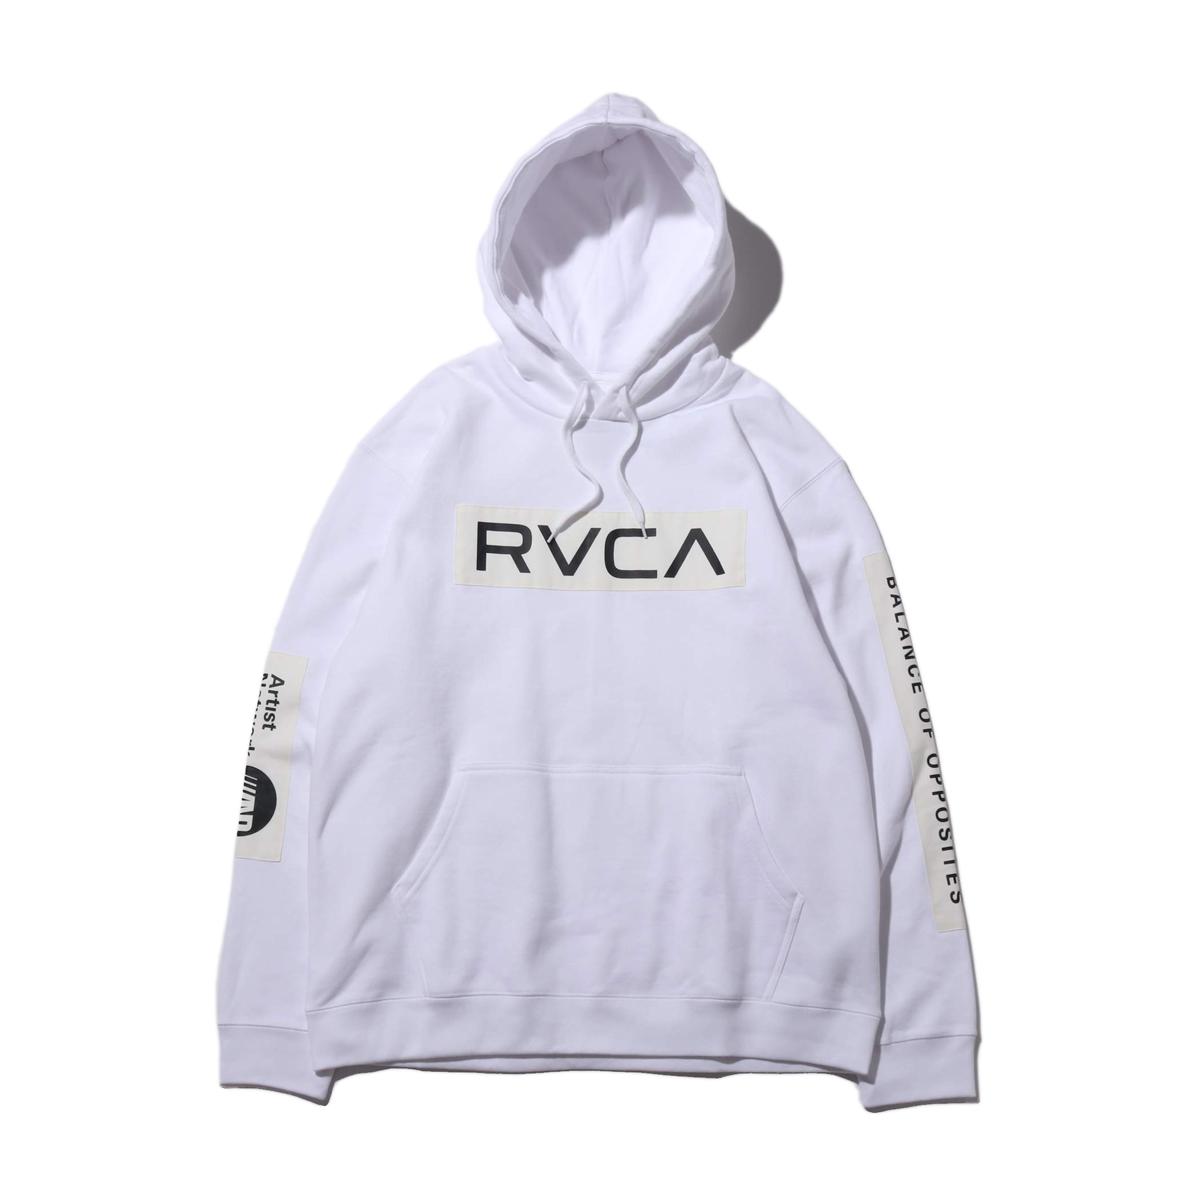 RVCA PATCH RVCA HOODIE(WHITE)(ルーカ パッチ ルーカ フーディー)【メンズ】【パーカー】【19FA-I】